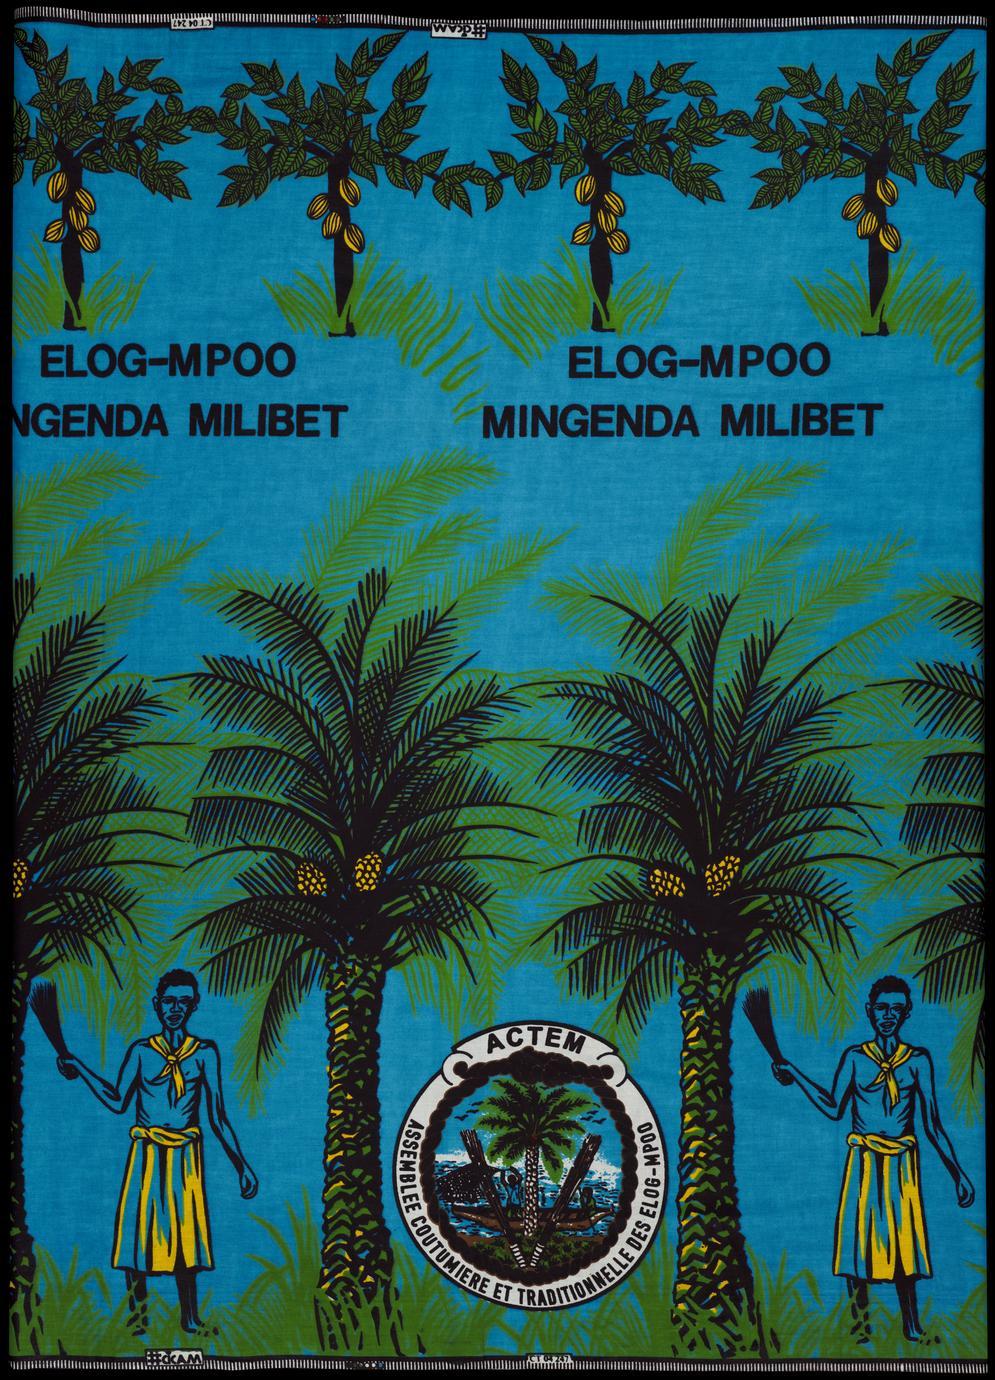 Elog-mpoo mingenda milibet (1 of 4)